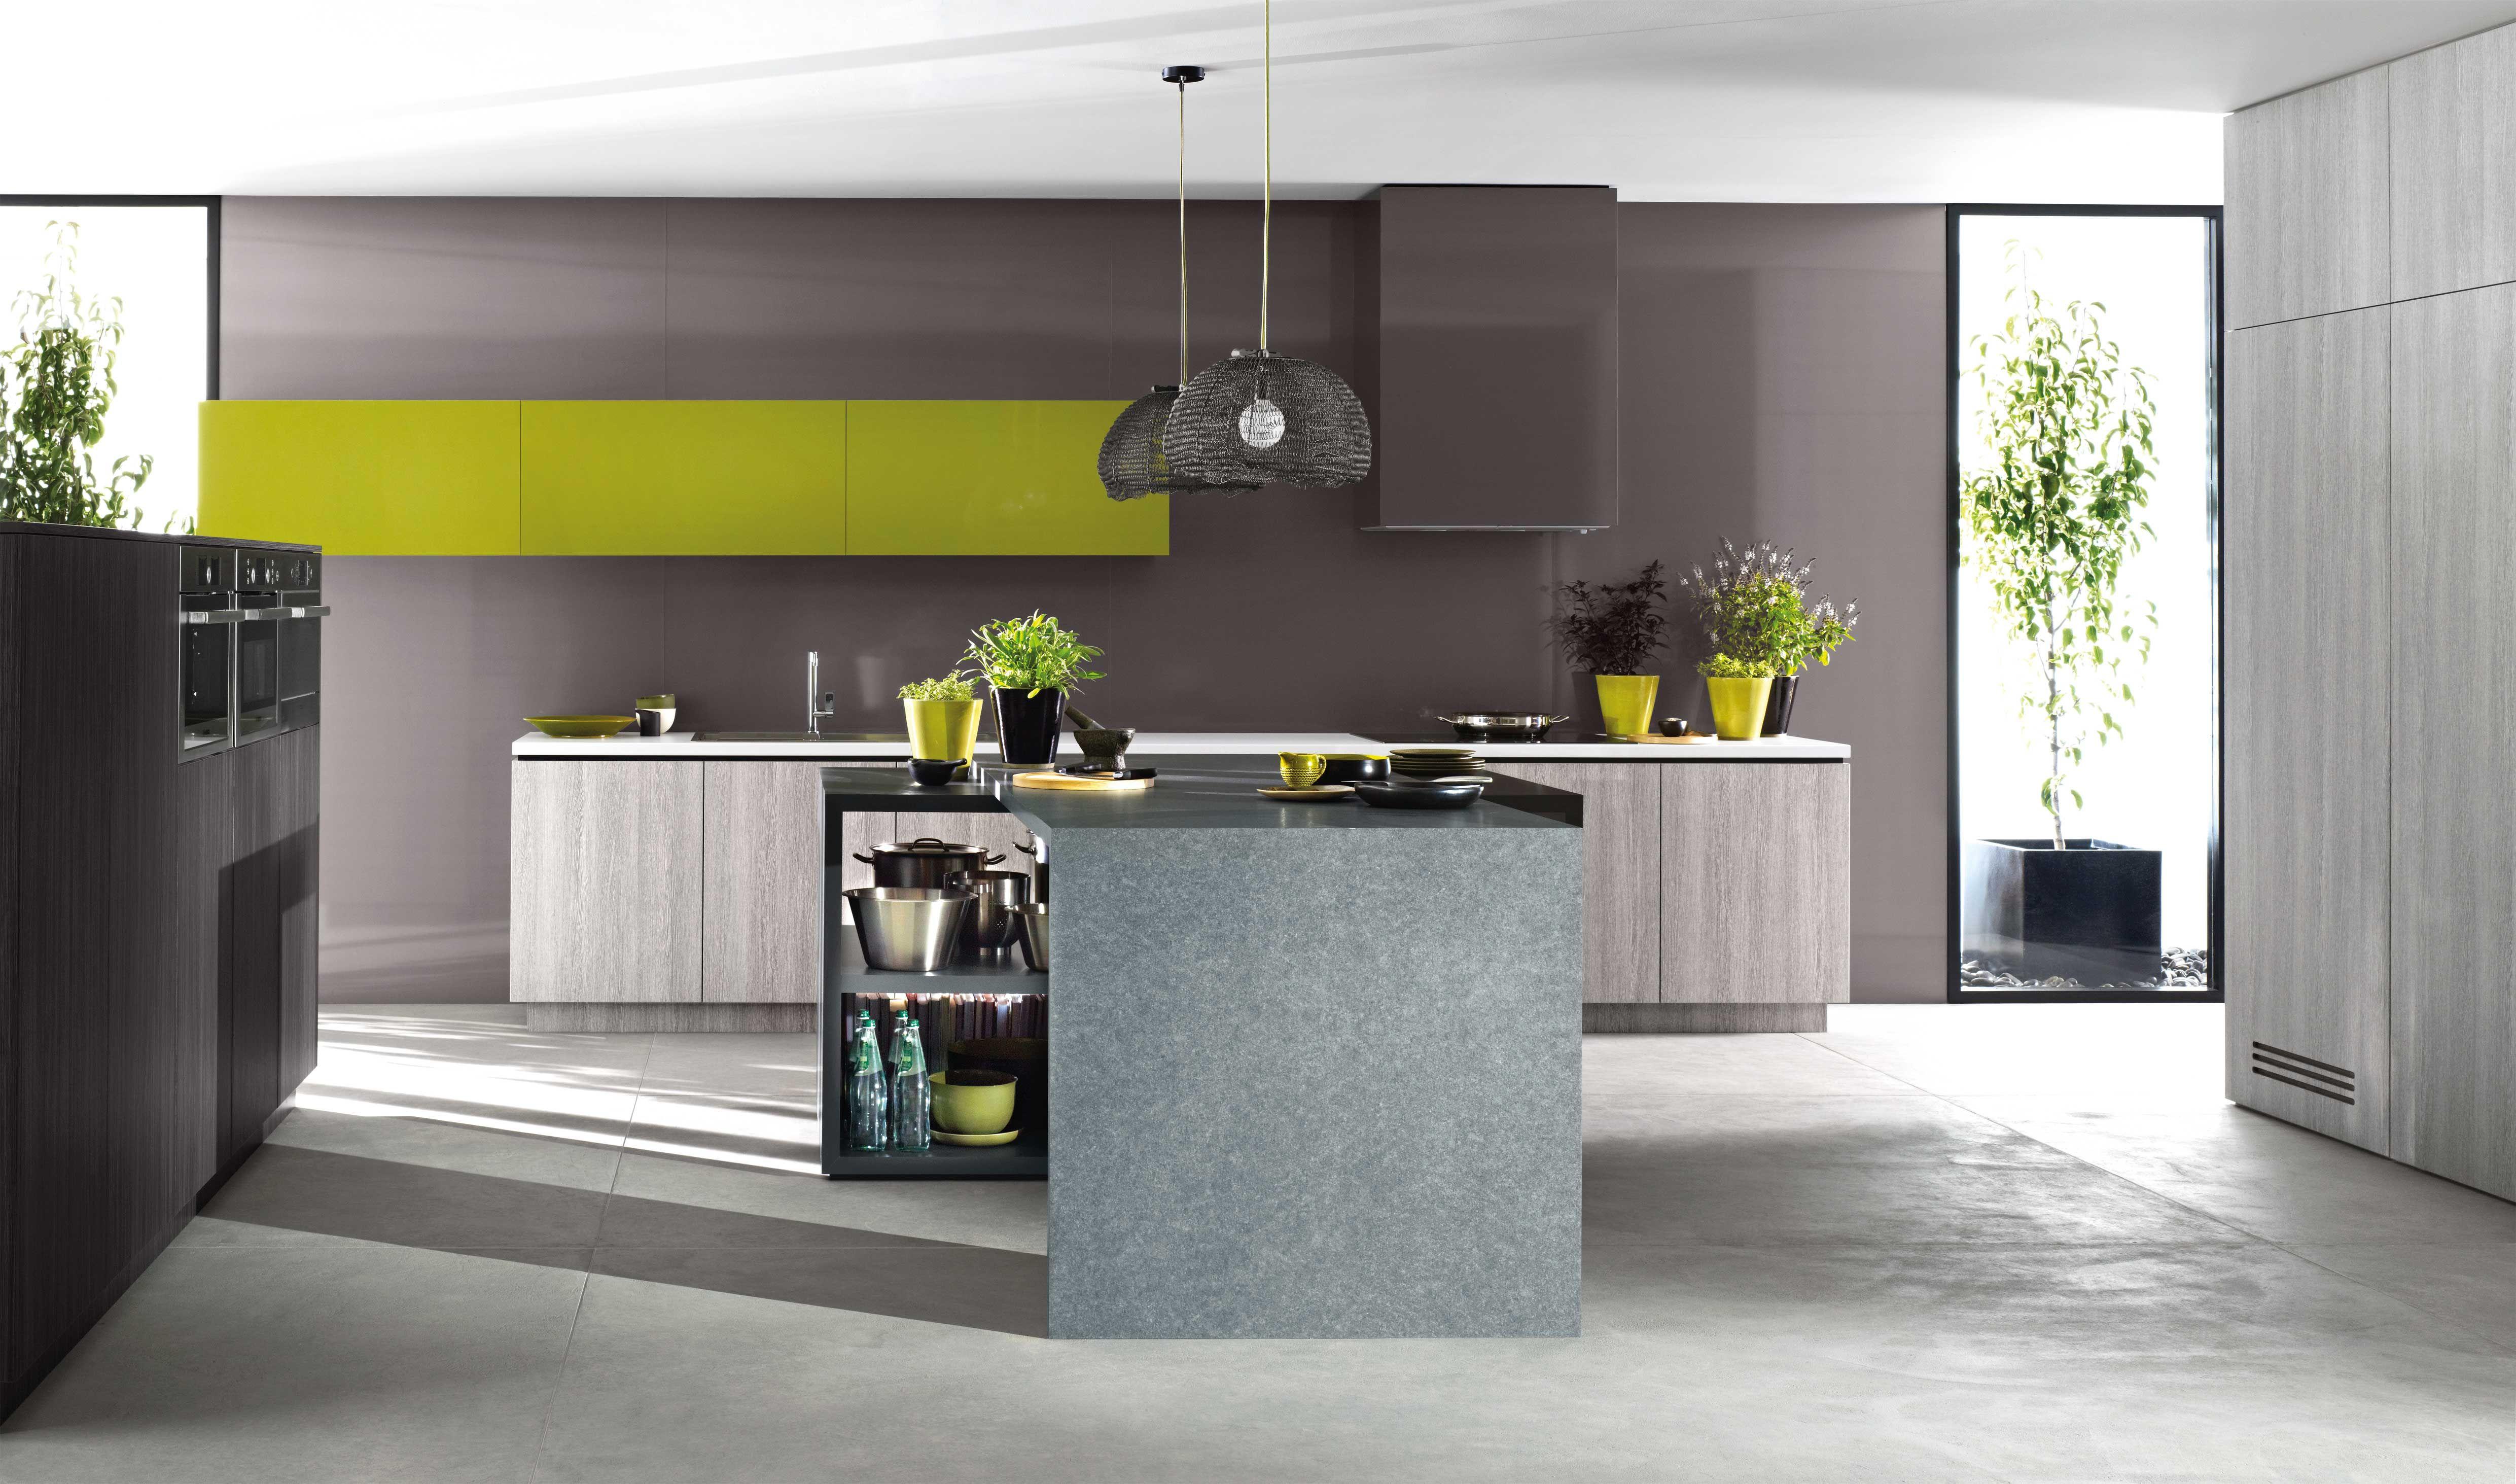 My Dream Kitchen As Seen At The 2013 Auckland Home Show Kitchendesign Ideas Kitchen Designer Outdoor Kitchen Cabinets Kitchen Design Kitchen Interior